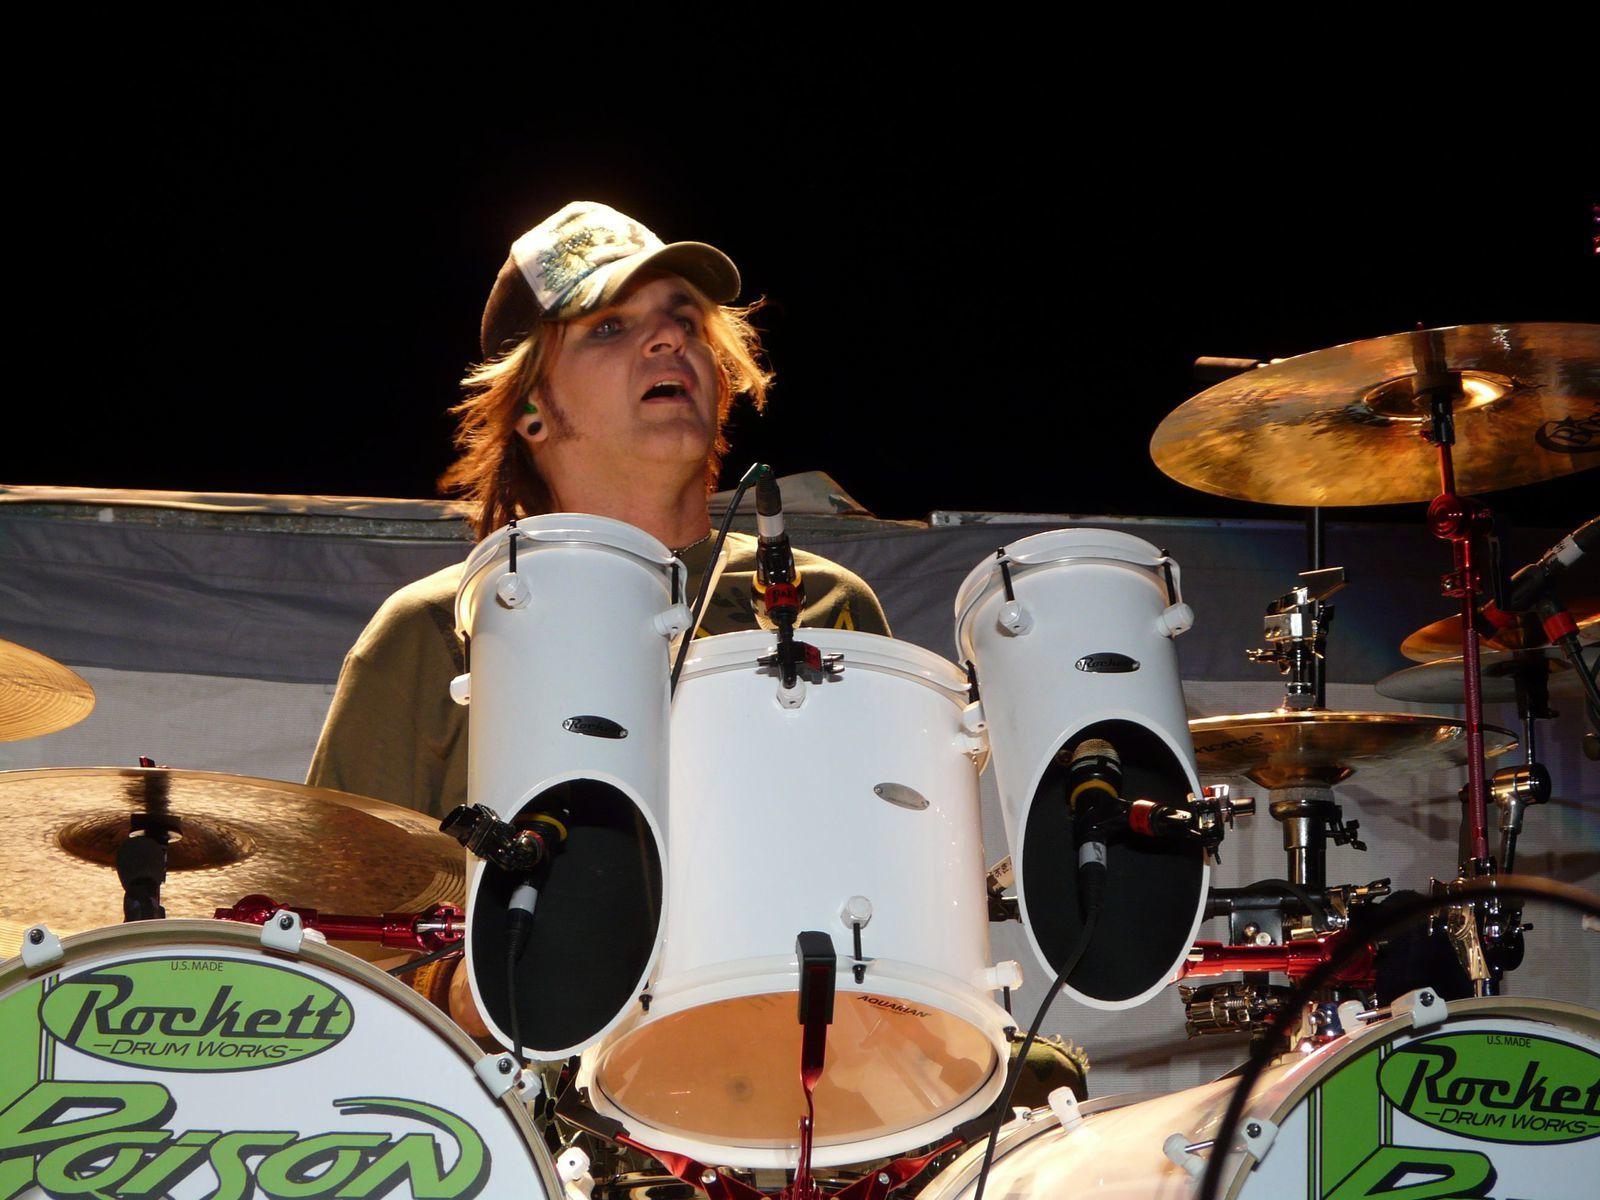 Rikki Rockett live with Poison on July 11, 2008 at the Moondance Jam